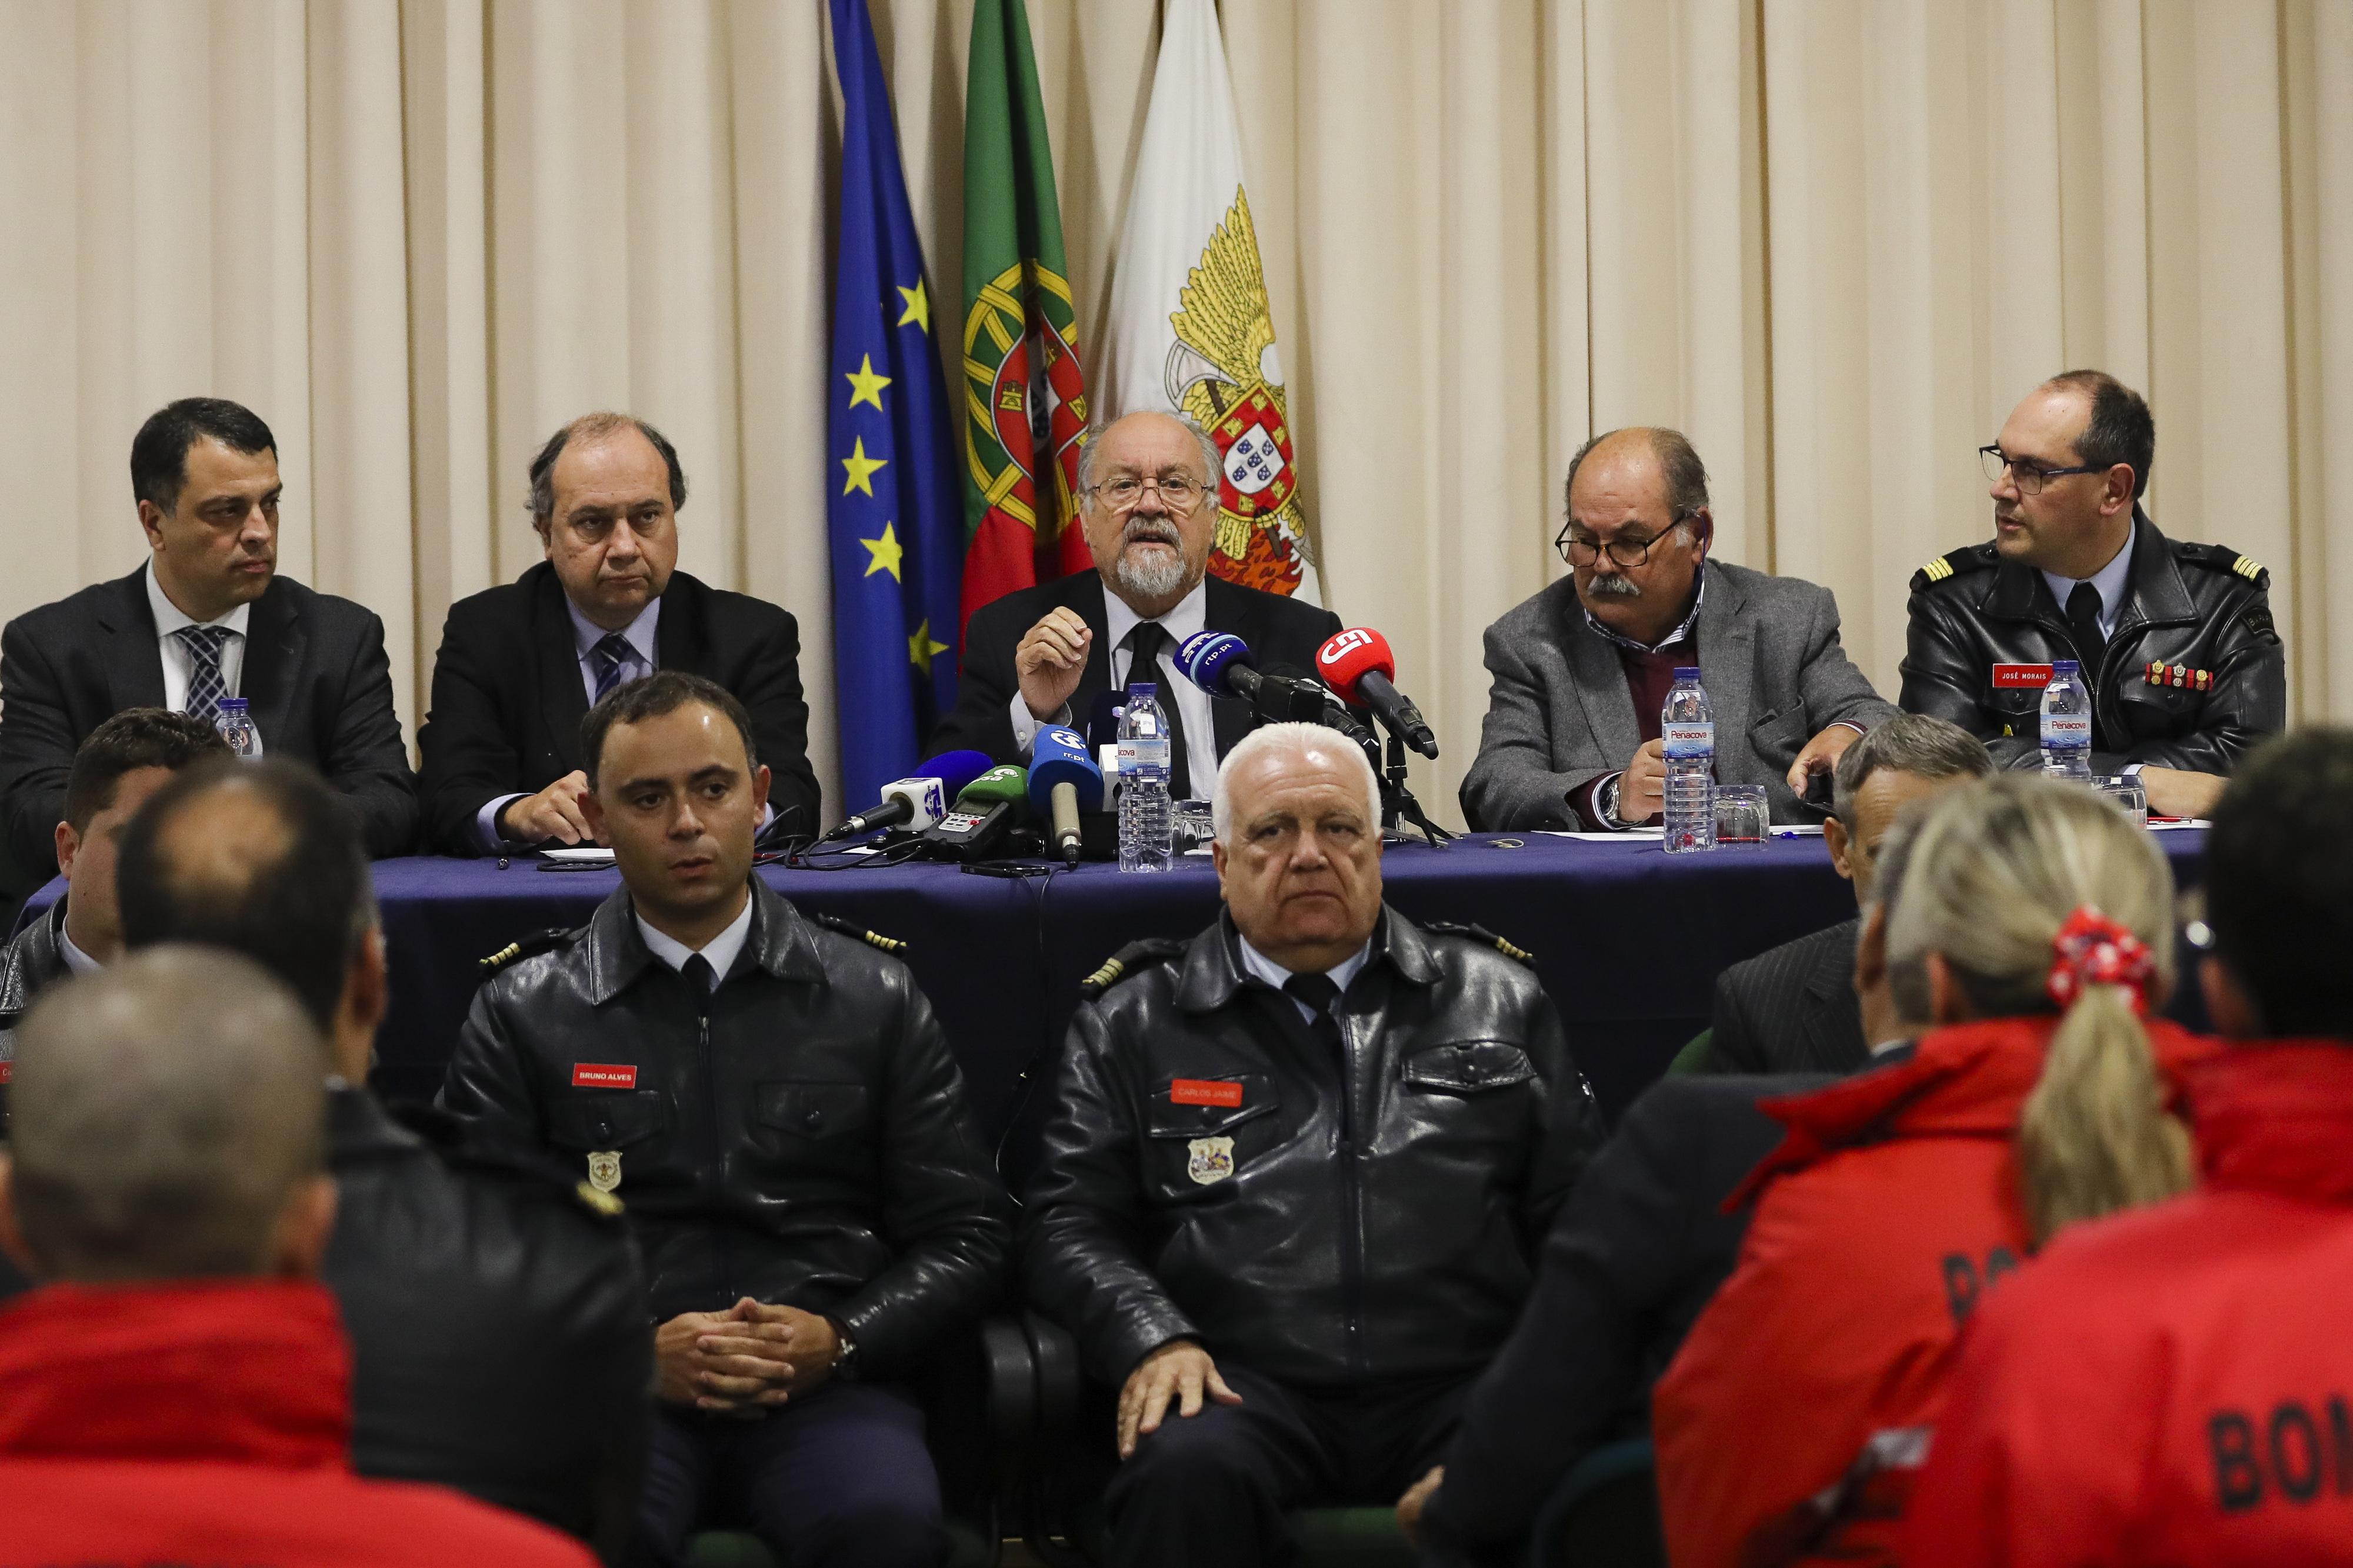 Presidente da República defende diálogo entre Governo e bombeiros